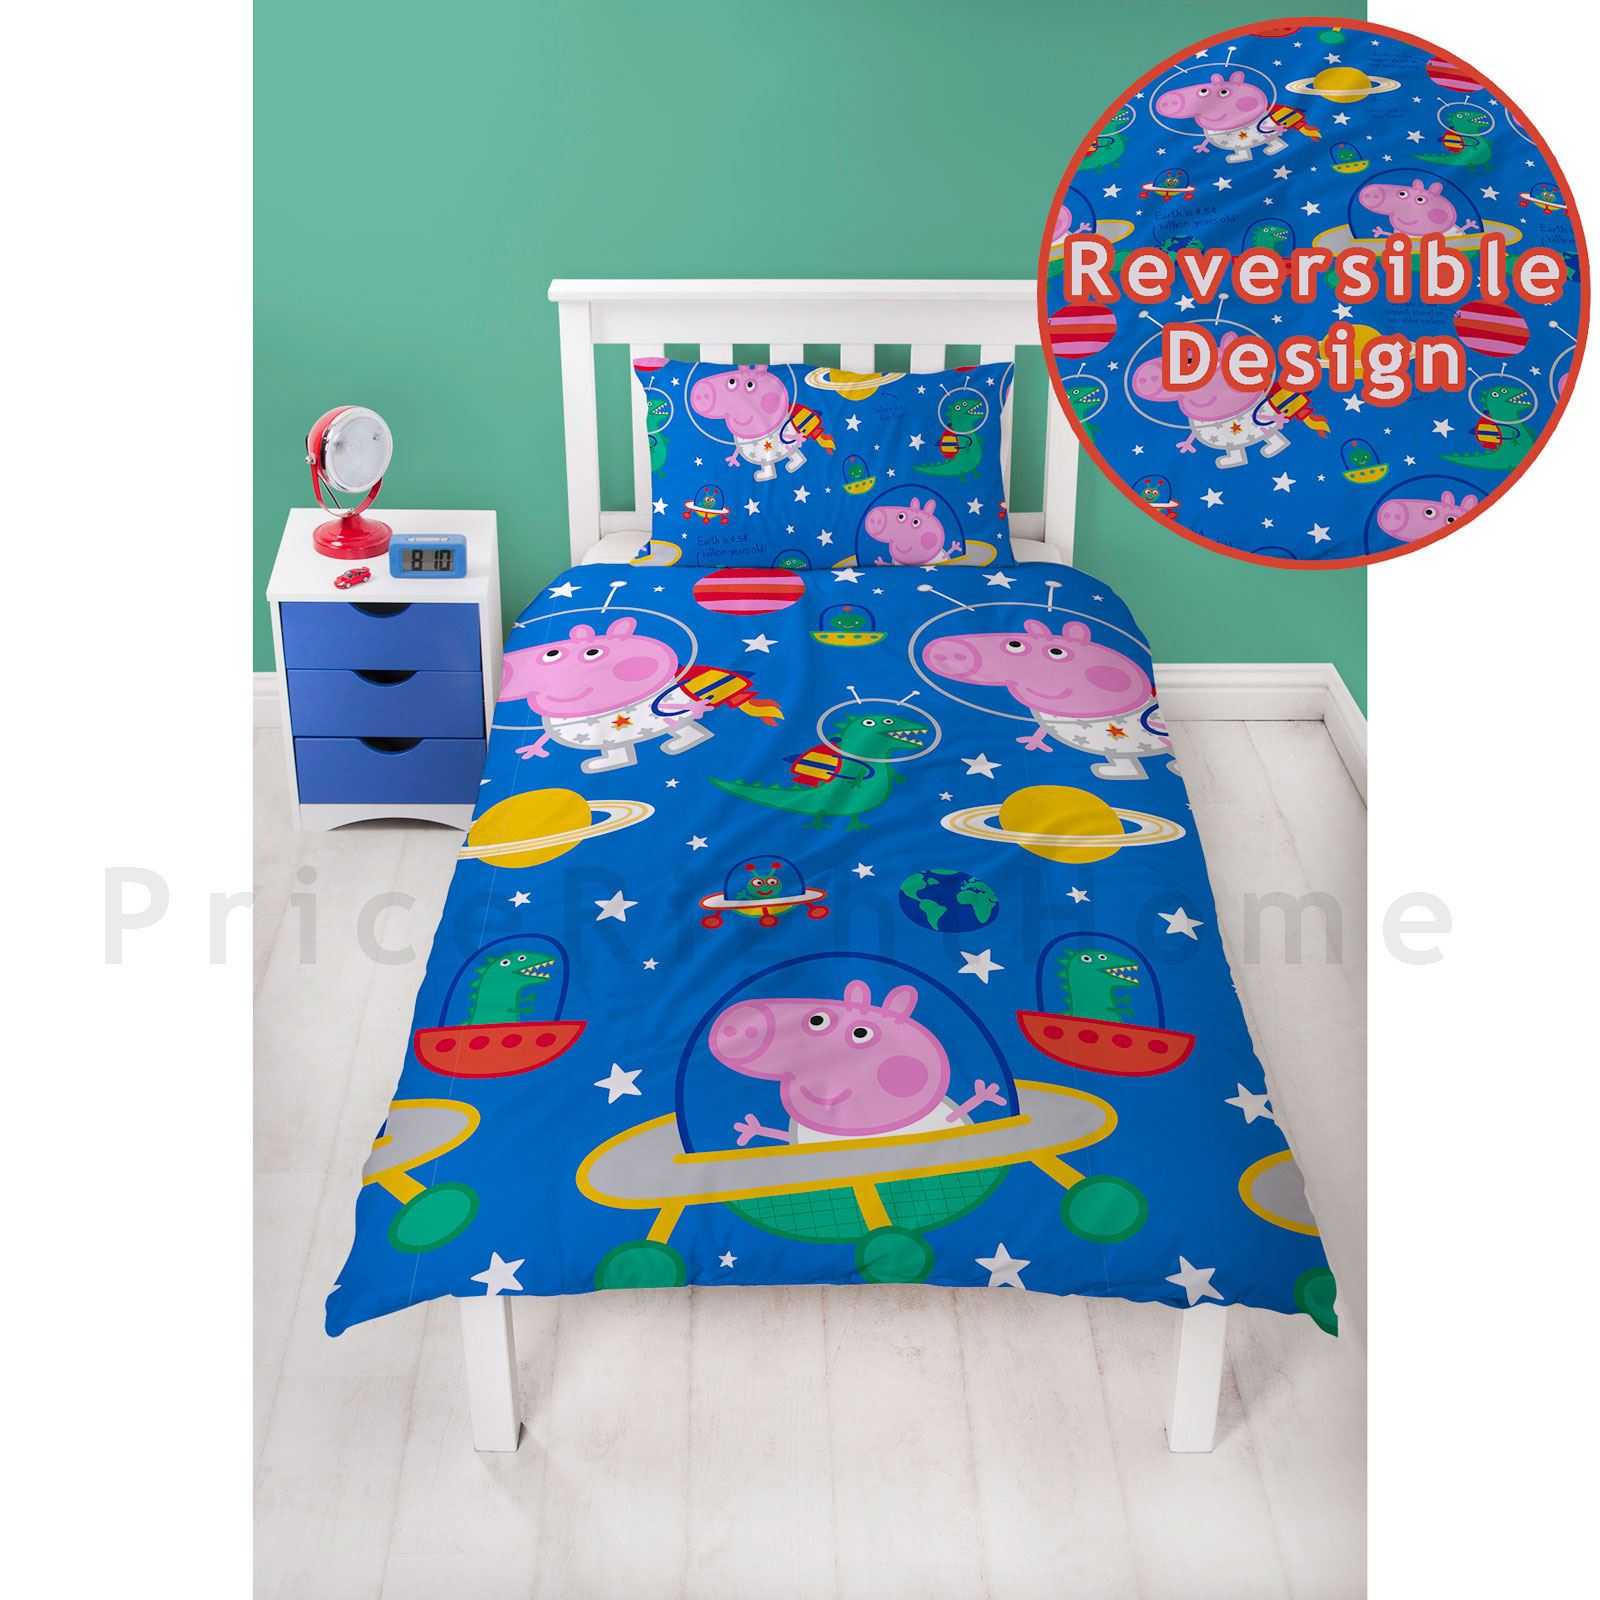 Peppa-PIG-amp-GEORGE-PIG-couette-couvre-tout-petit-Unique-amp-Double-Tailles